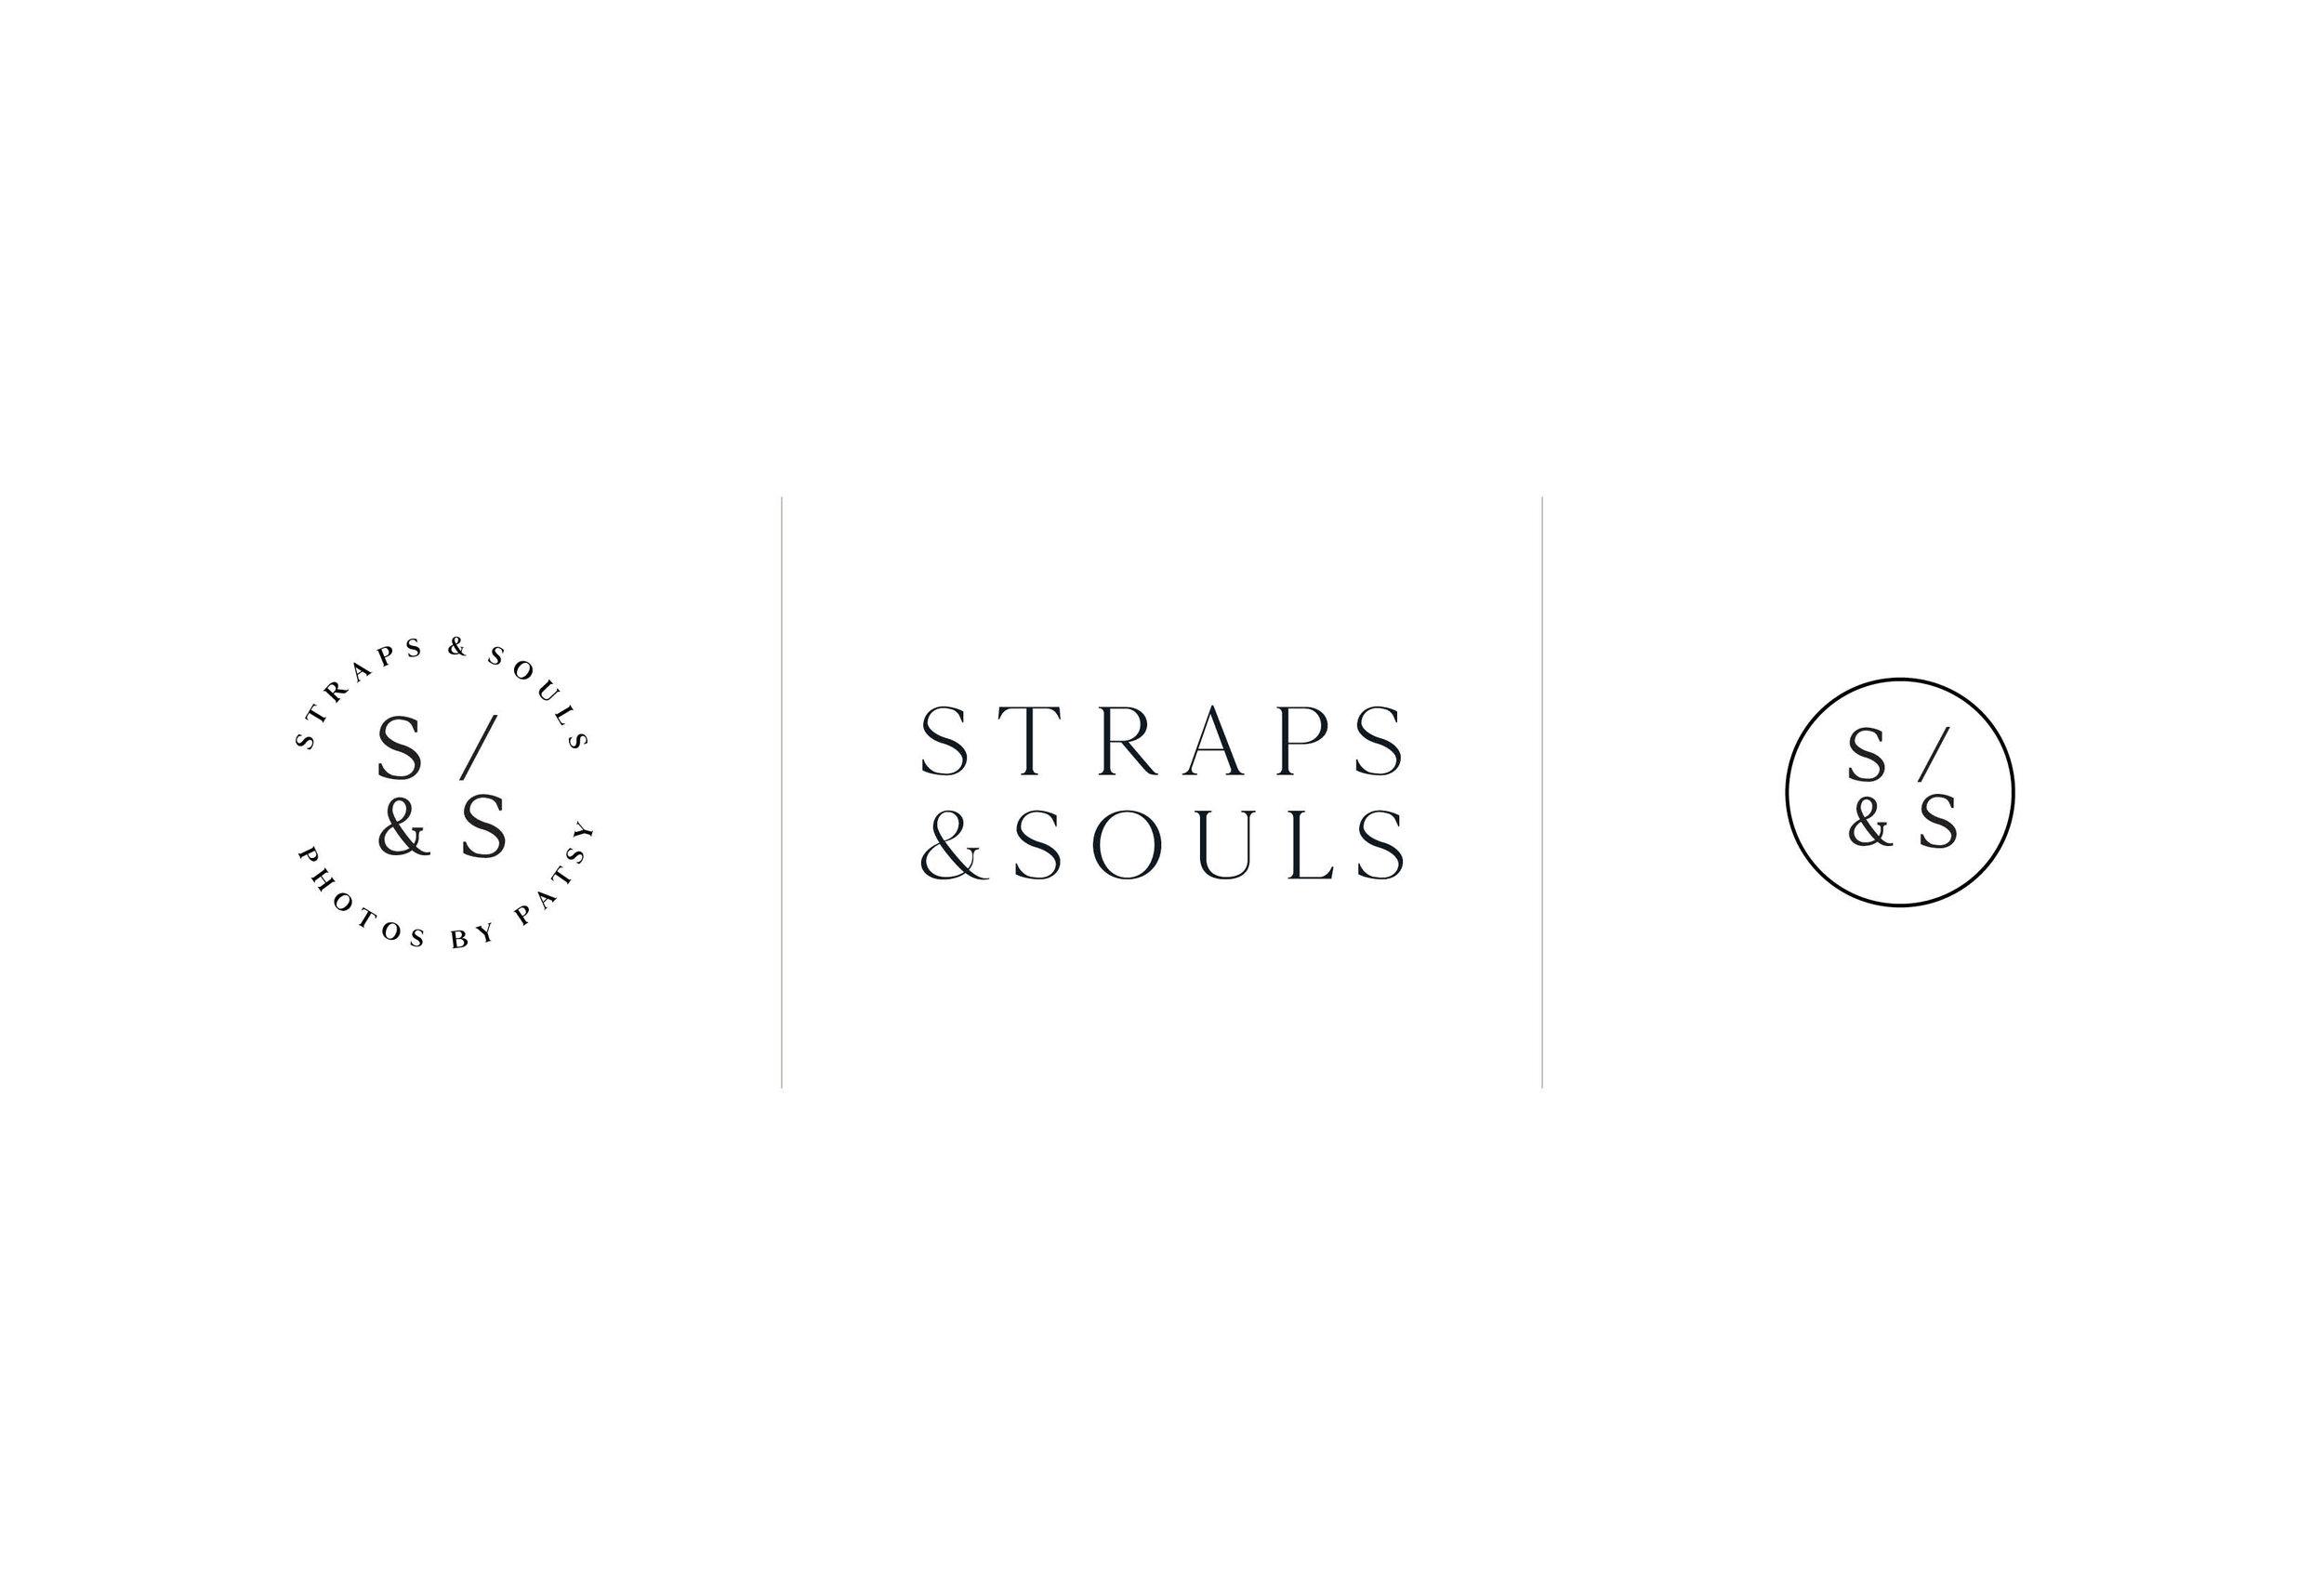 Straps_Souls7.jpg